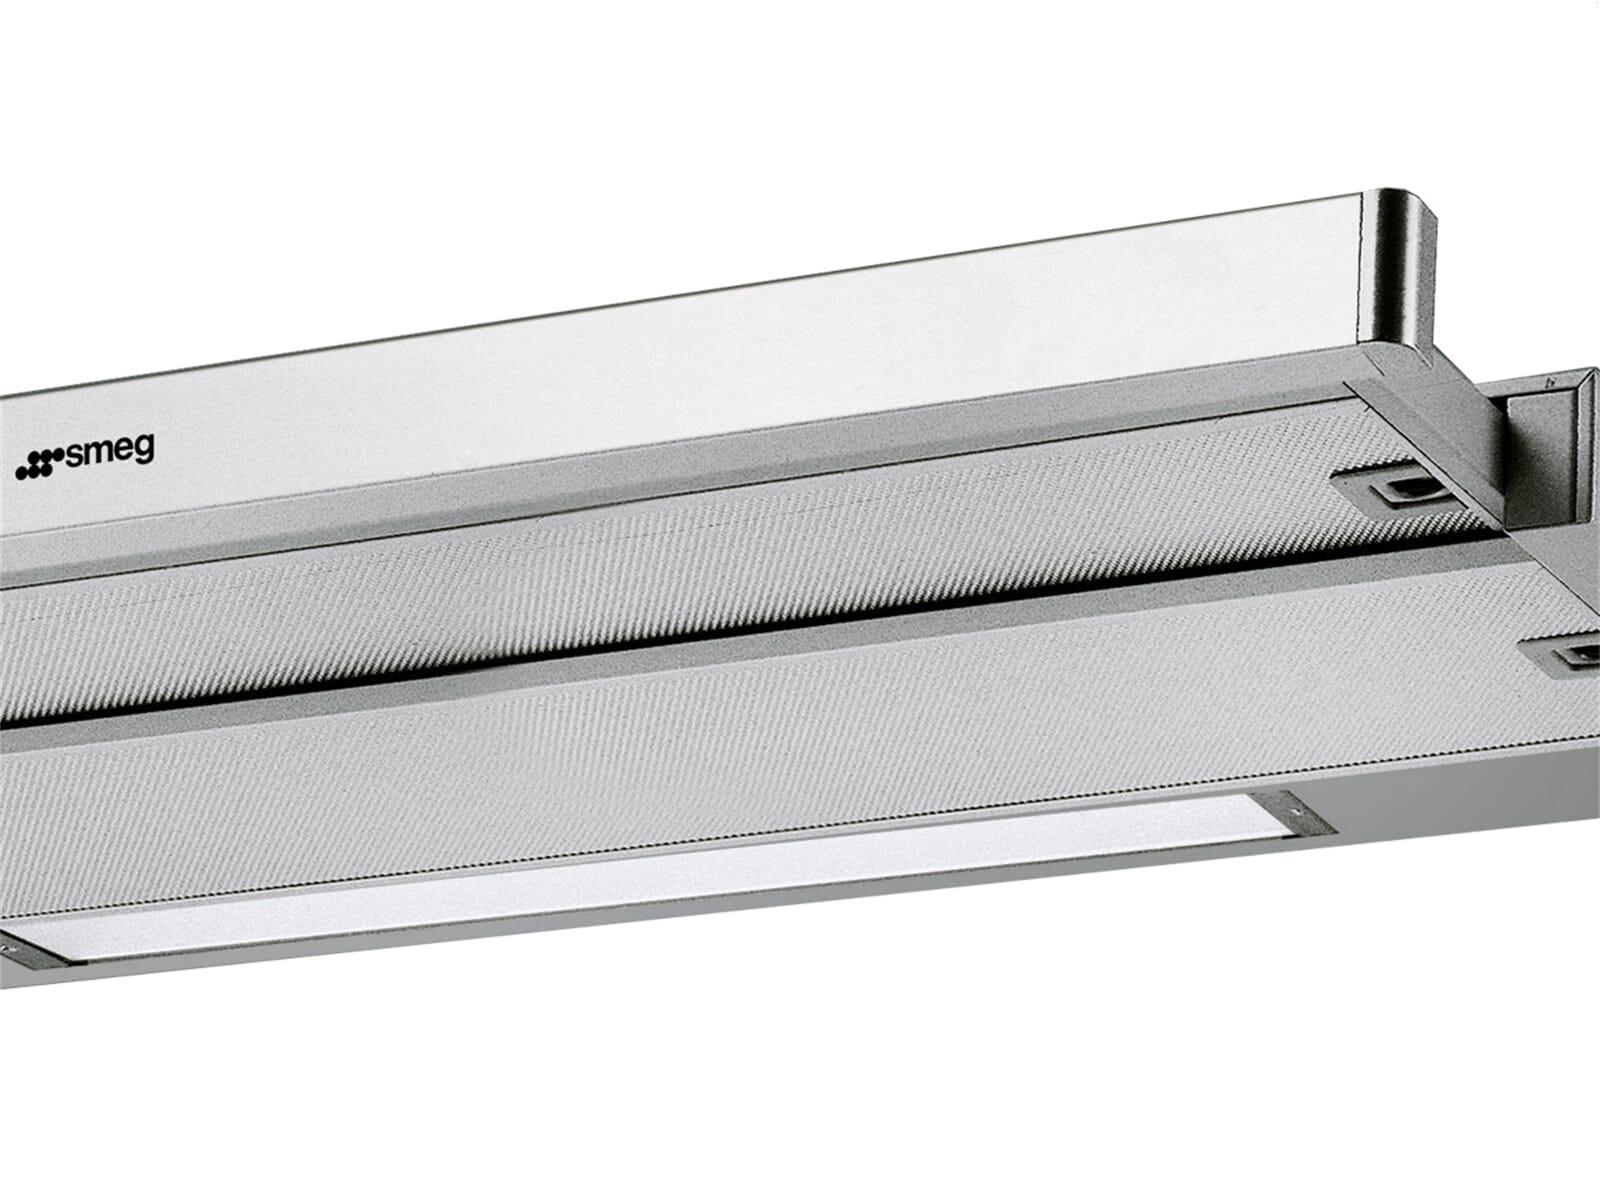 smeg kset9x flachschirm dunstabzugshaube edelstahl f r 289 00 eur. Black Bedroom Furniture Sets. Home Design Ideas